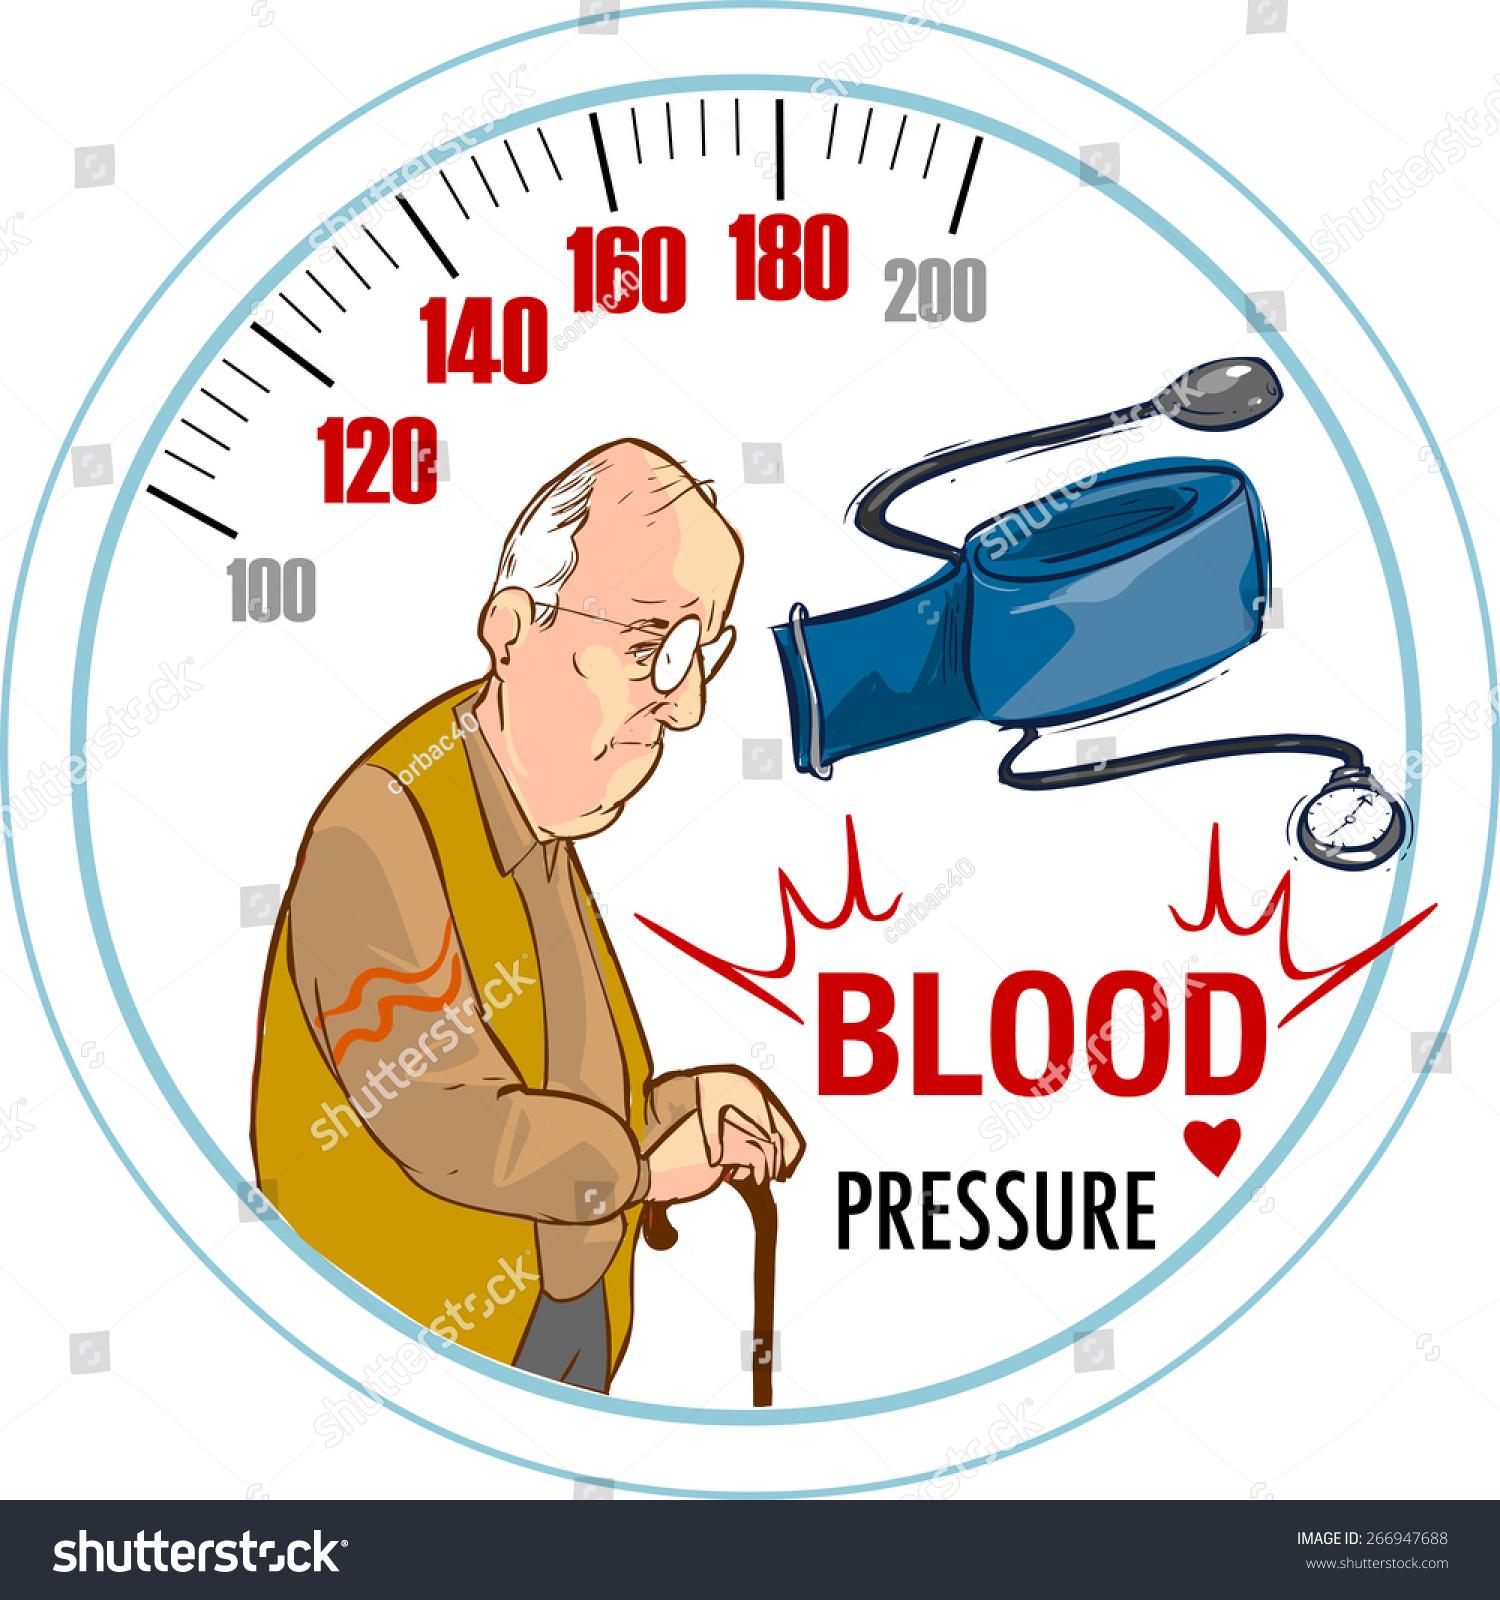 clipart blood pressure - photo #44